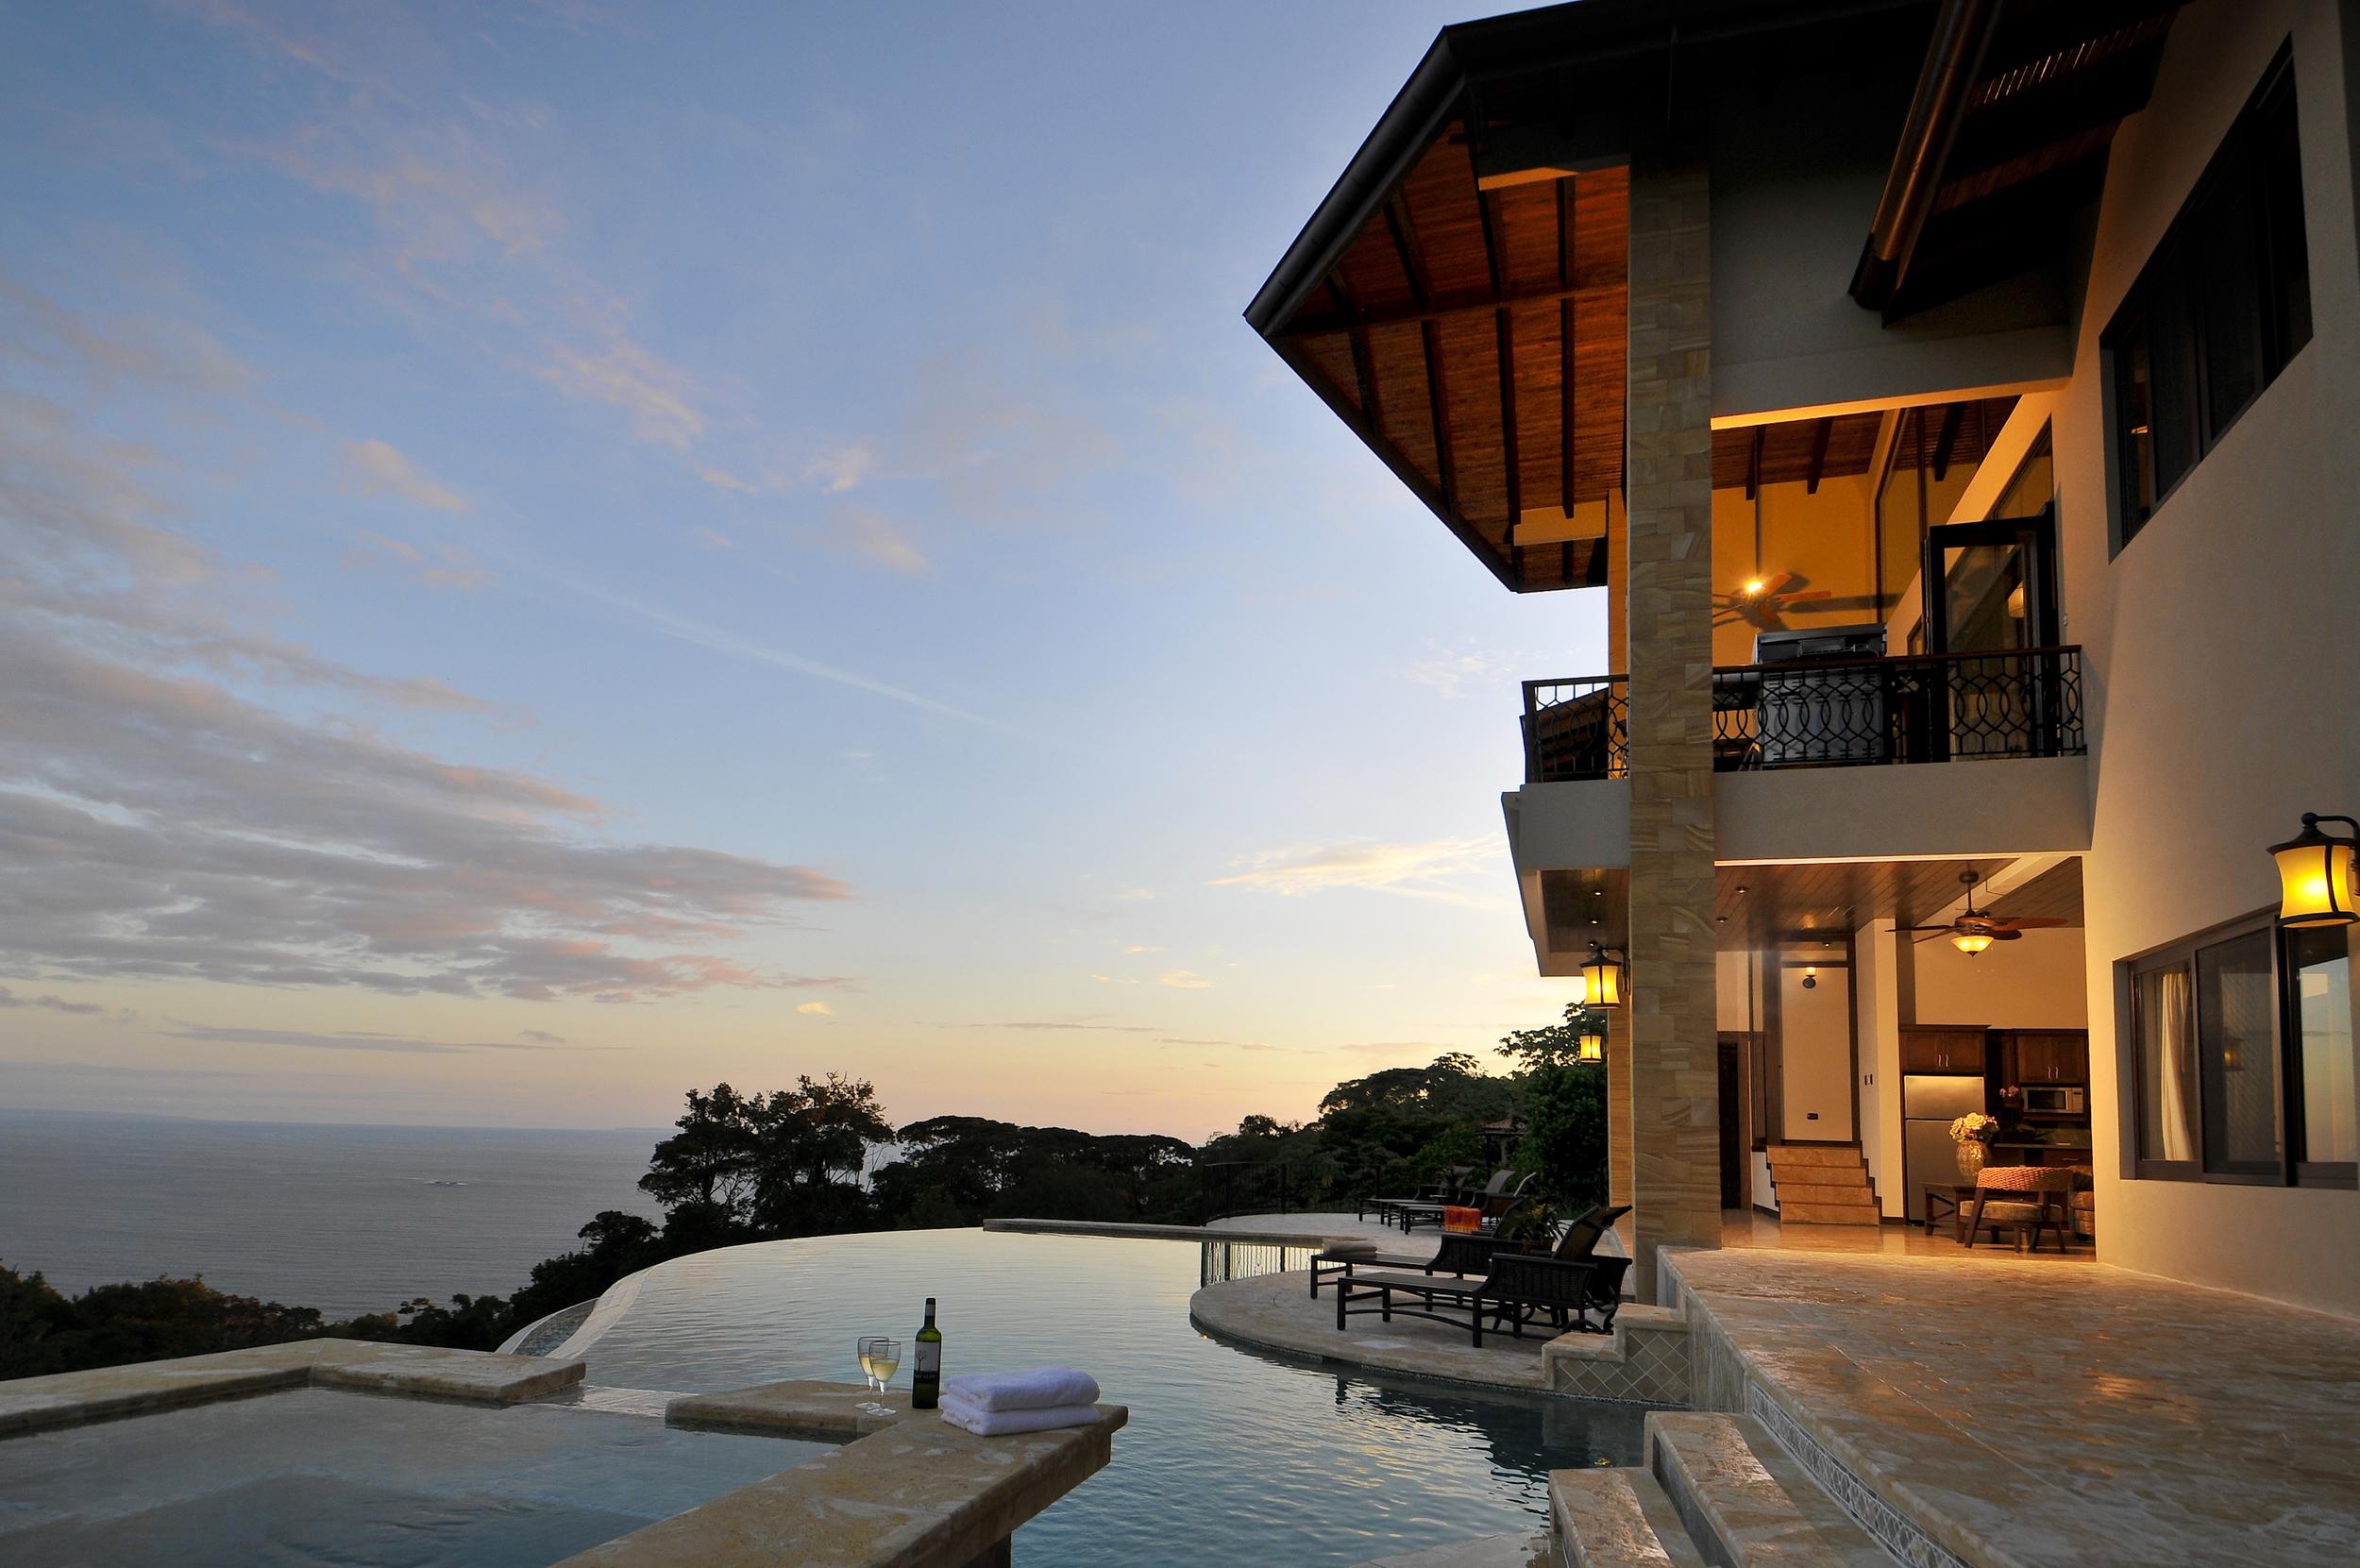 flex5-yoga-retreat-costa-rica-villa-pool-balcony-ocean-view.jpg